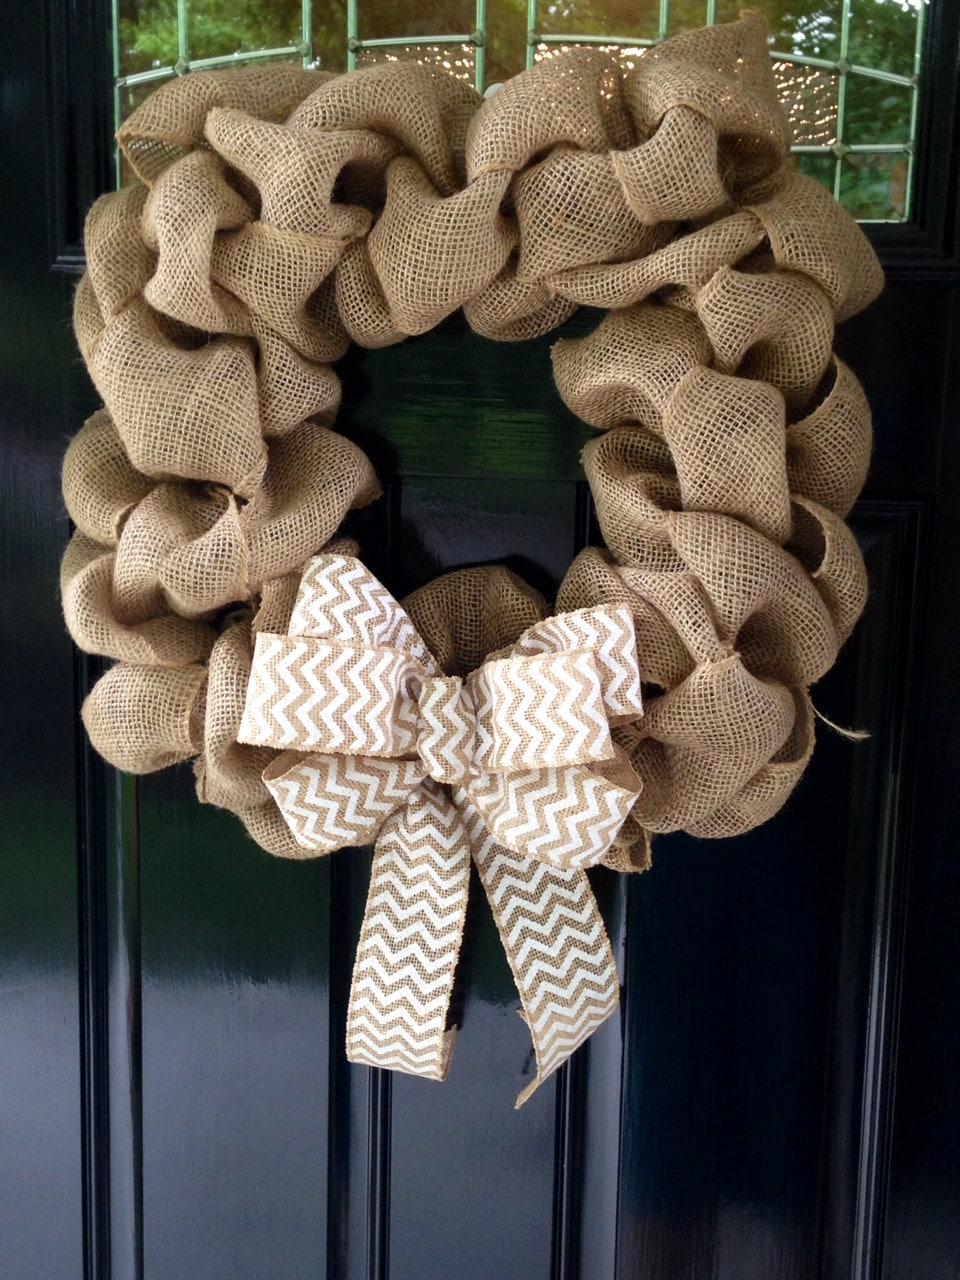 Square Burlap Wreath With White Chevron Burlap Ribbon